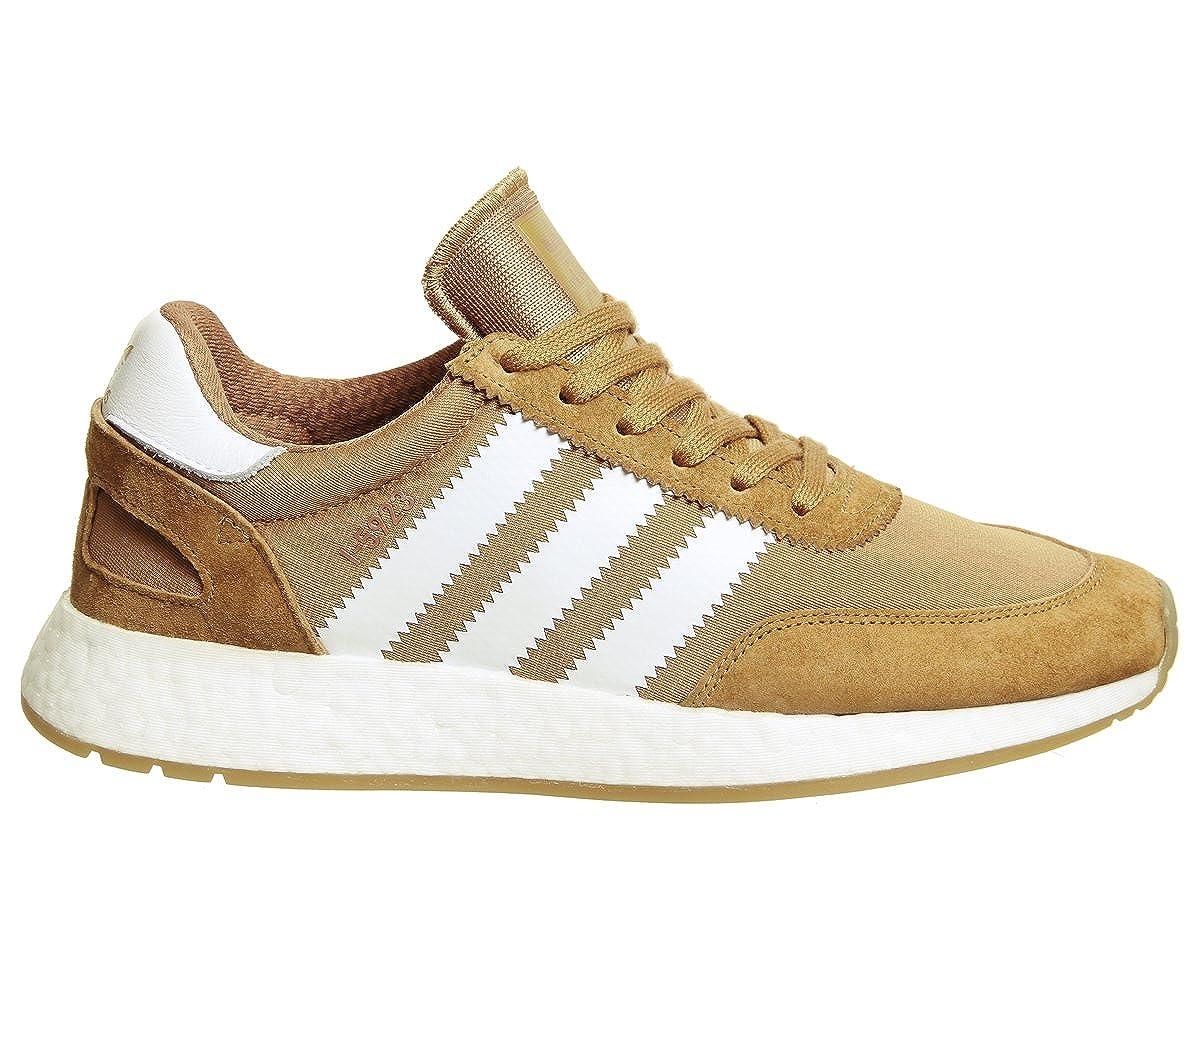 Adidas Originals Originals Originals Turnschuhe I-5923 CQ2491 Braun  8c6311